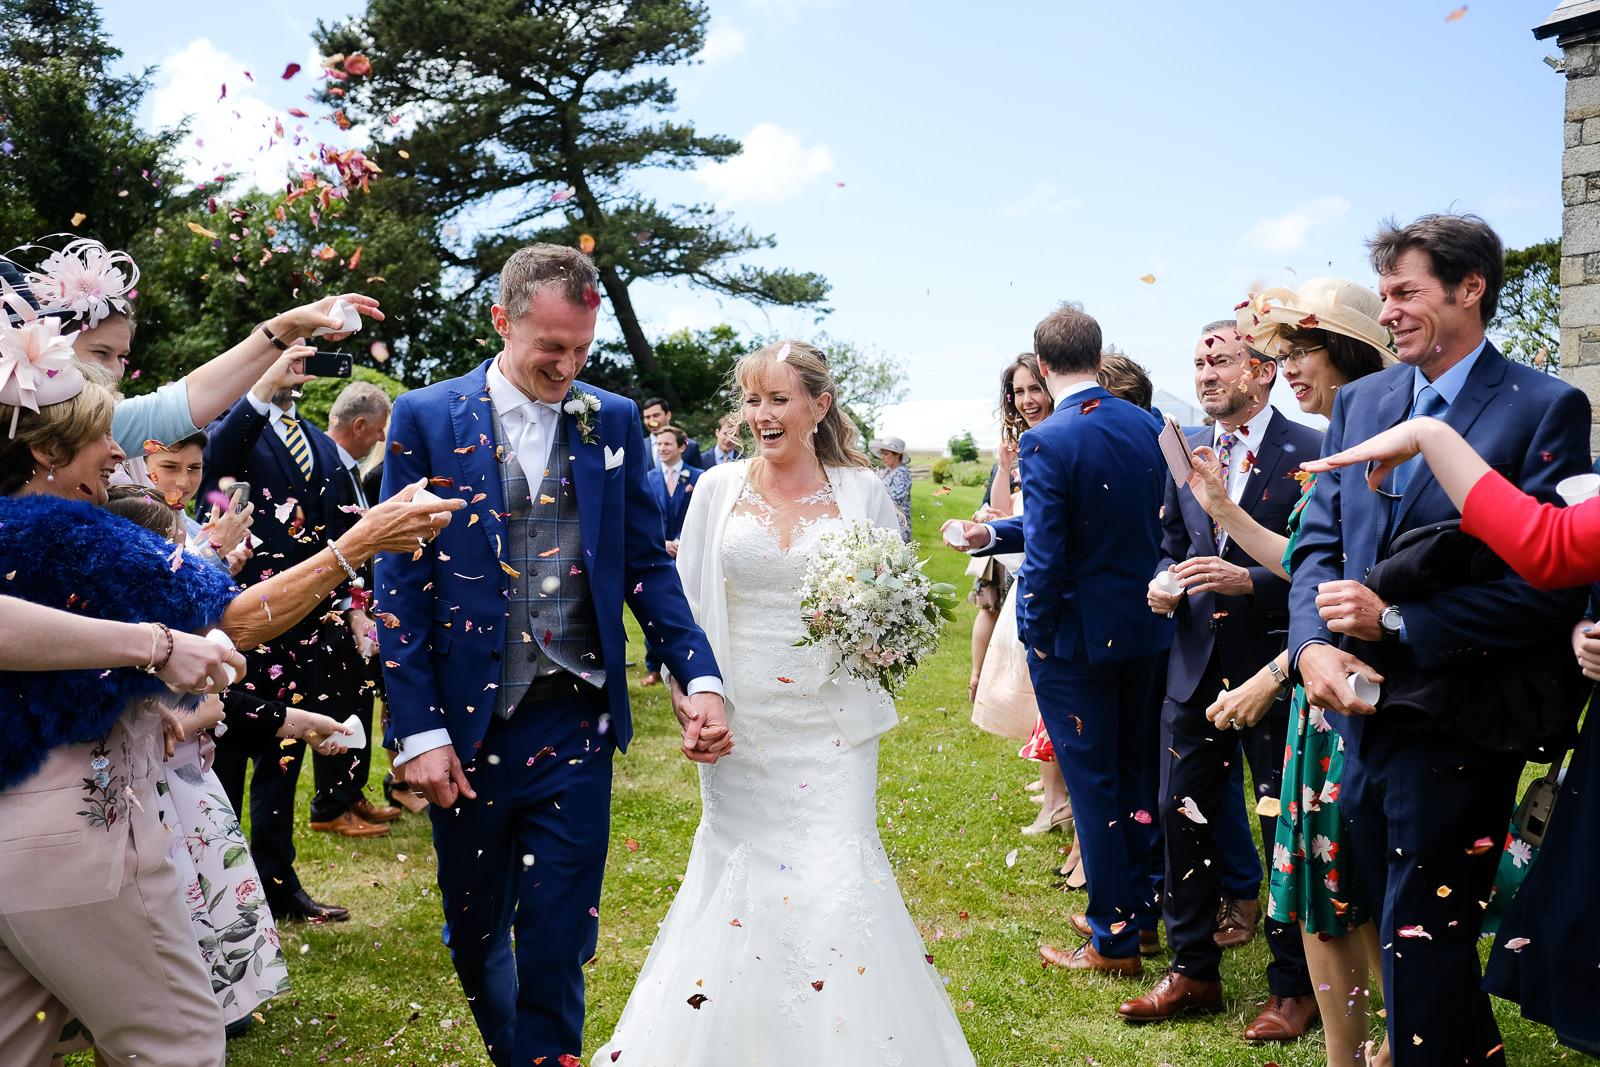 Roscarrock Farm wedding in Cornwall 040.jpg